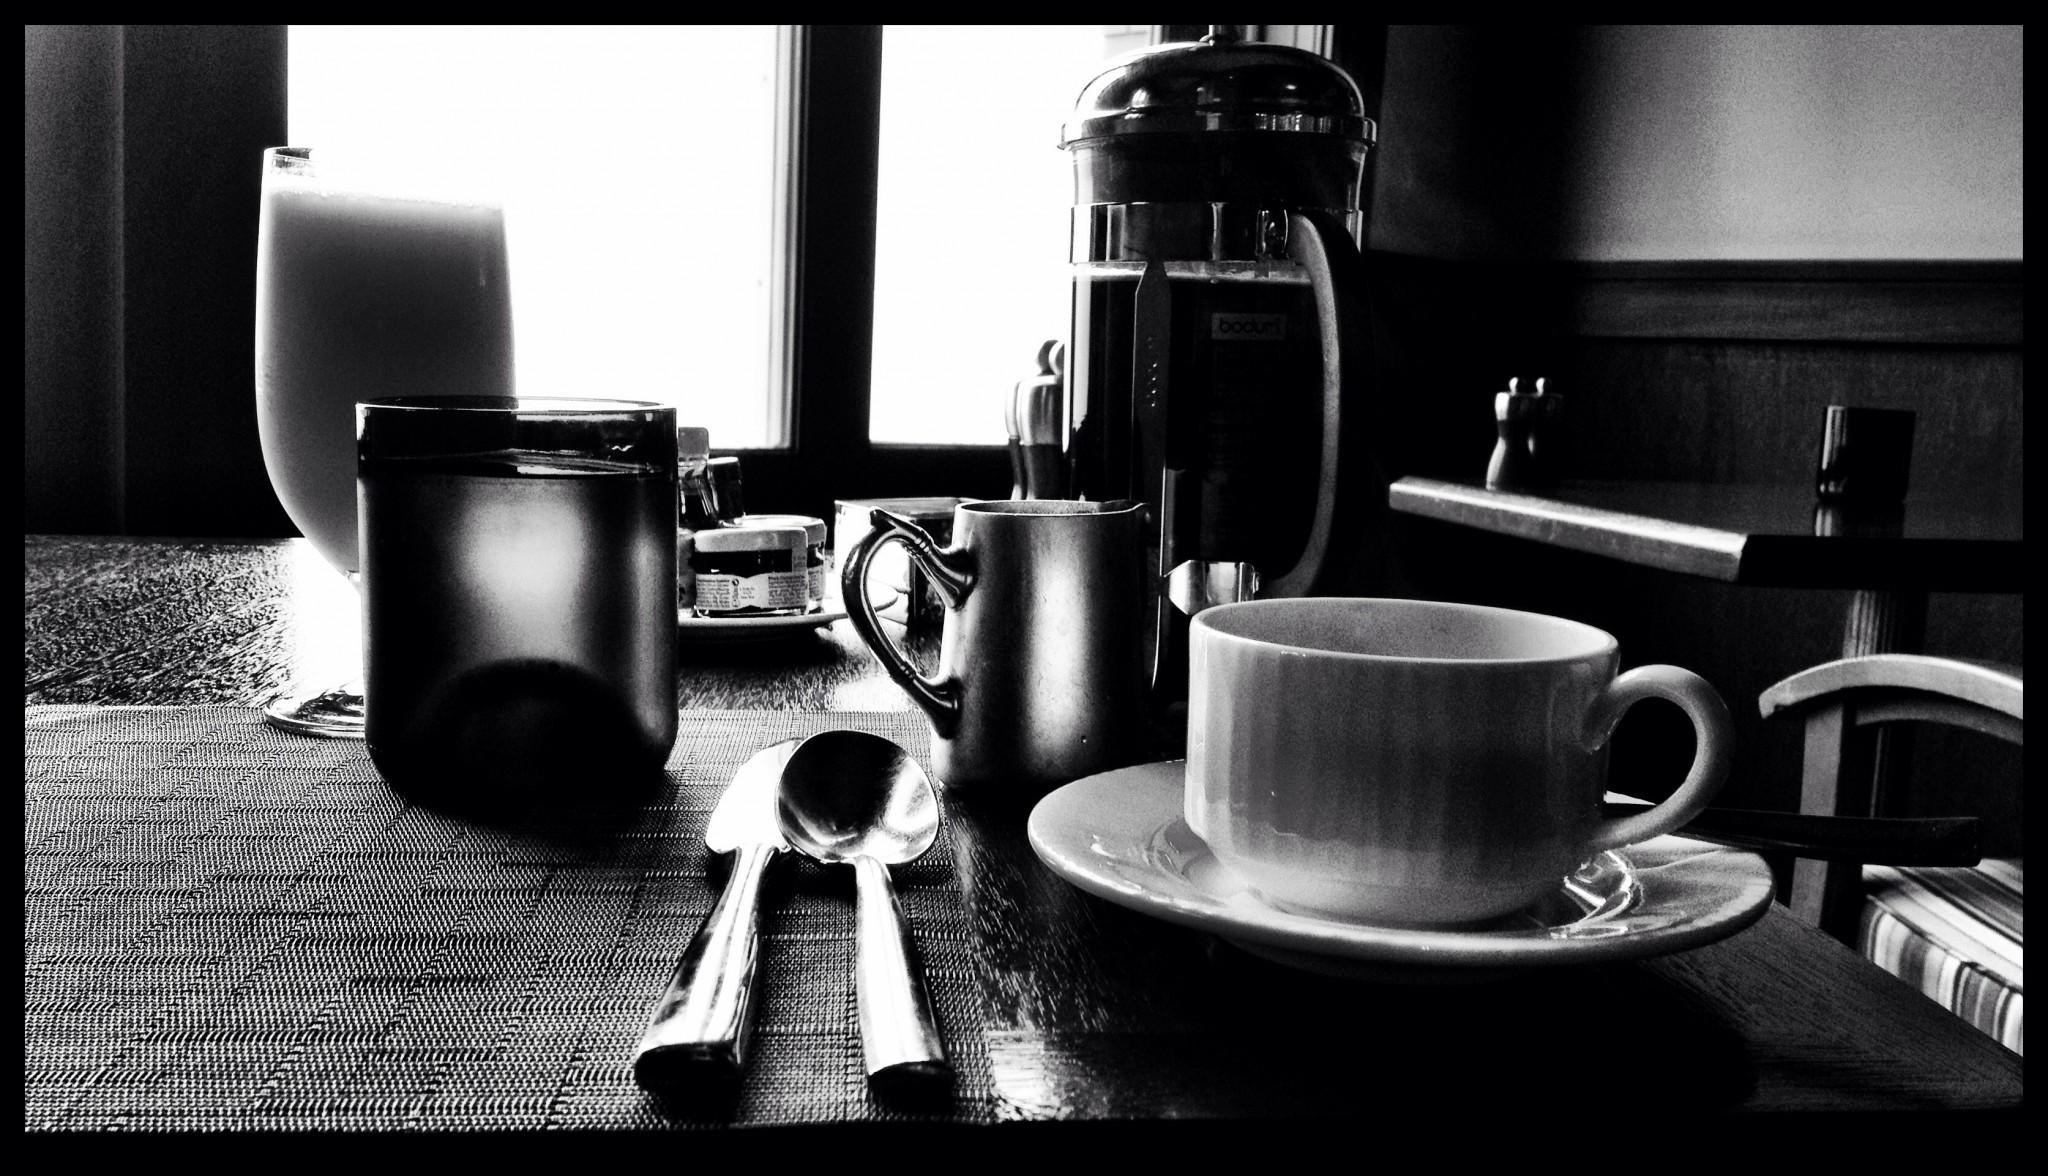 Zelfkoffiezetten - Koffie zetten met de Cafetière / French Press?